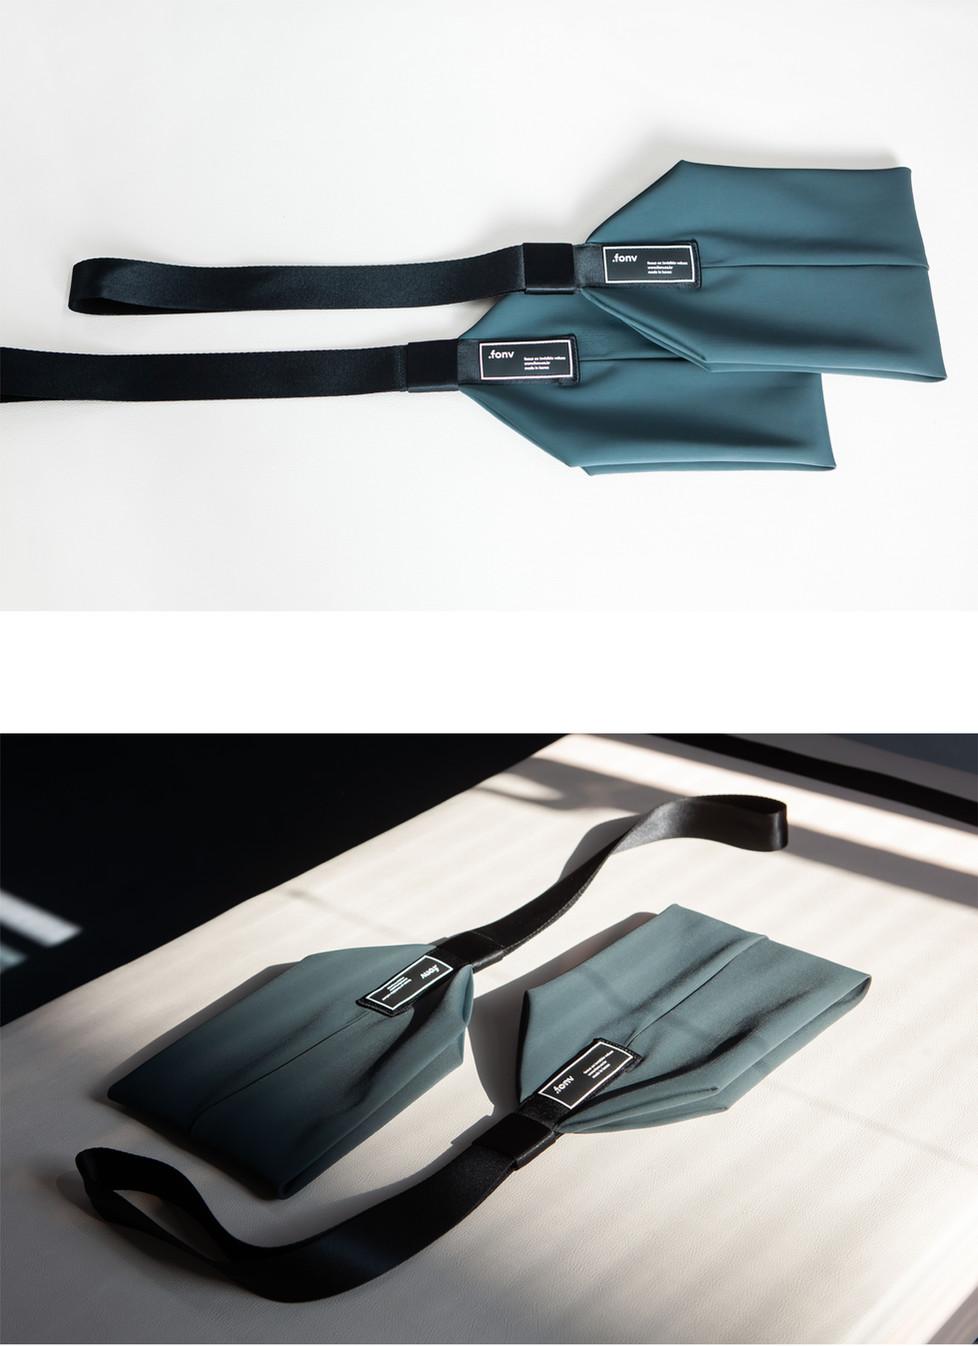 210126_hammock strap_대지 1 사본 10.jpg